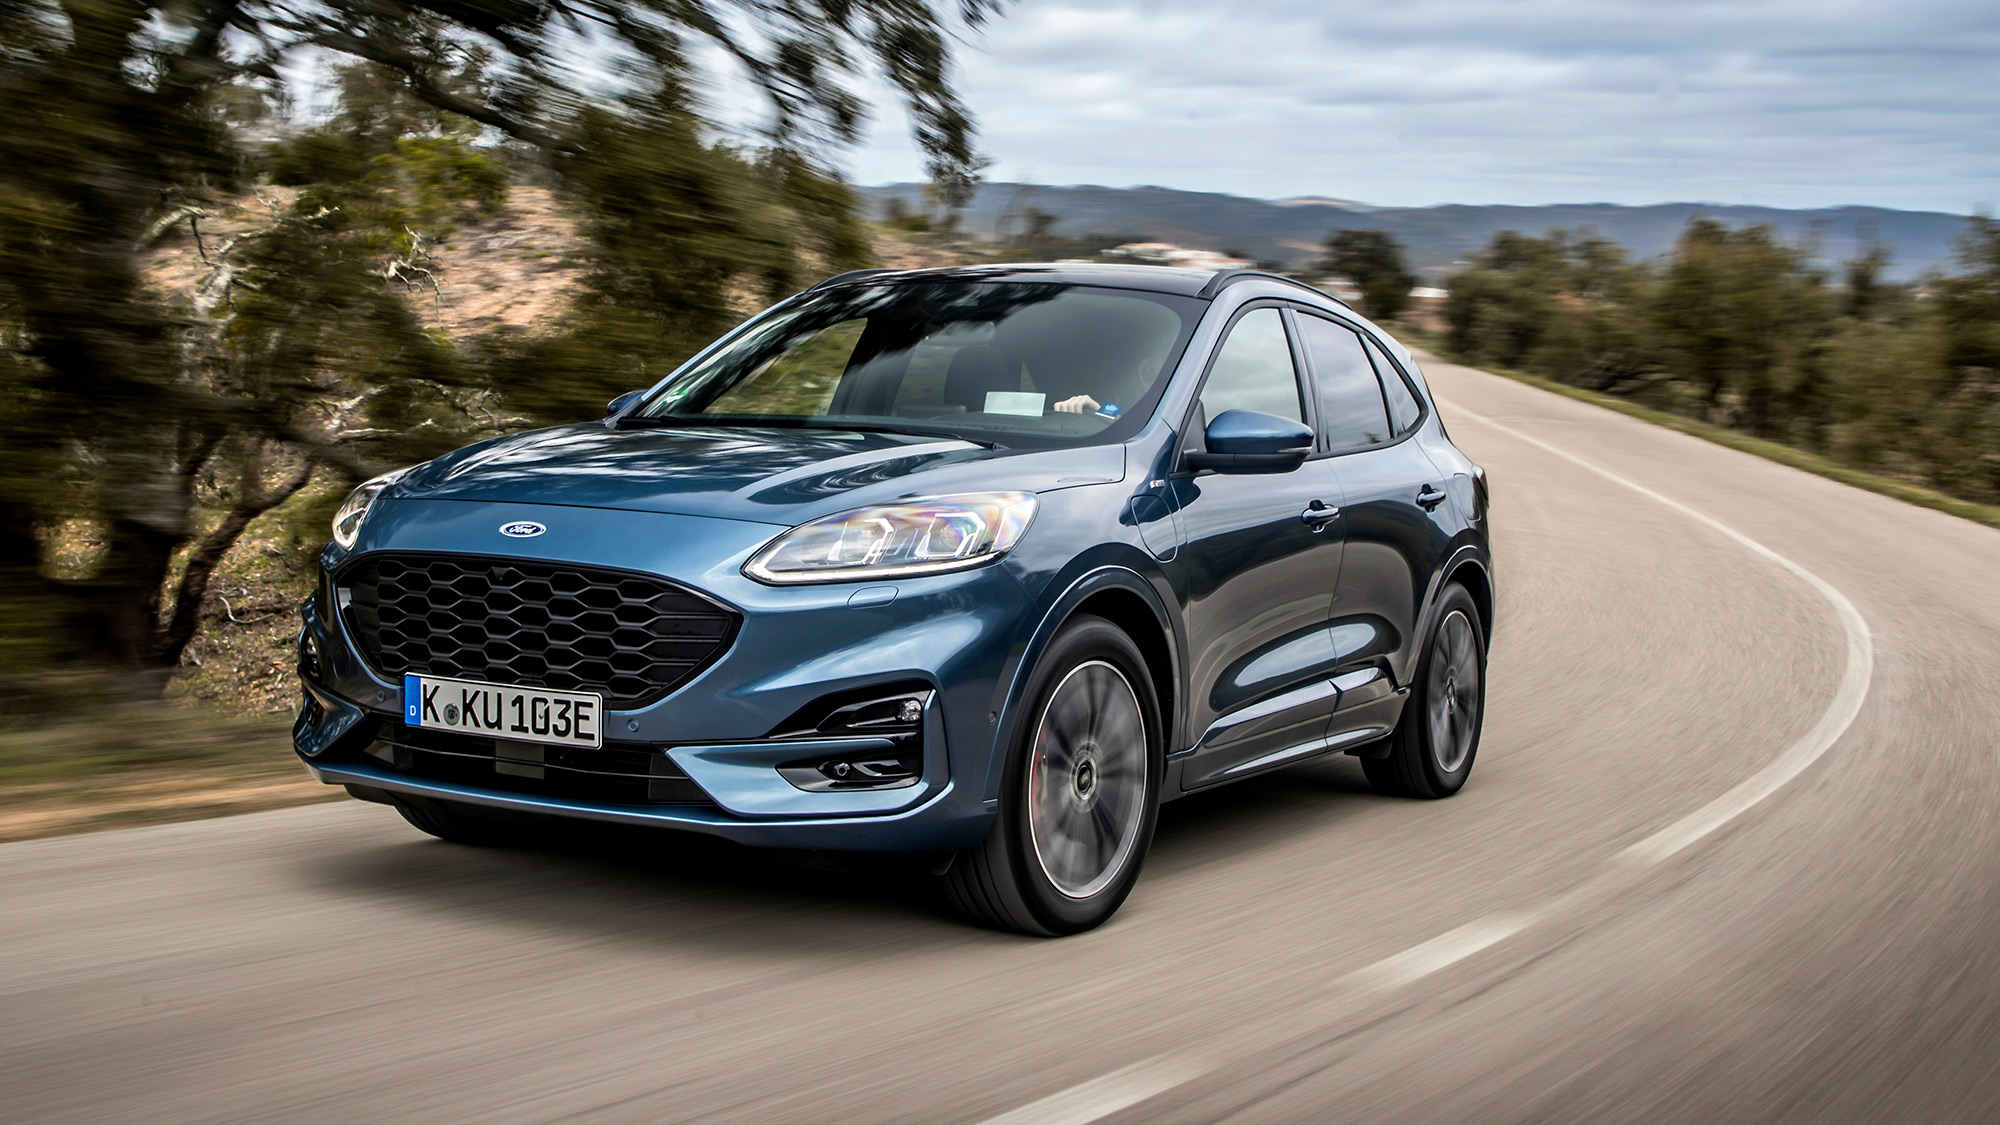 H Ford θέλει να πουλά μόνο ηλεκτρικά ΙΧ στην Ευρώπη έως το 2030